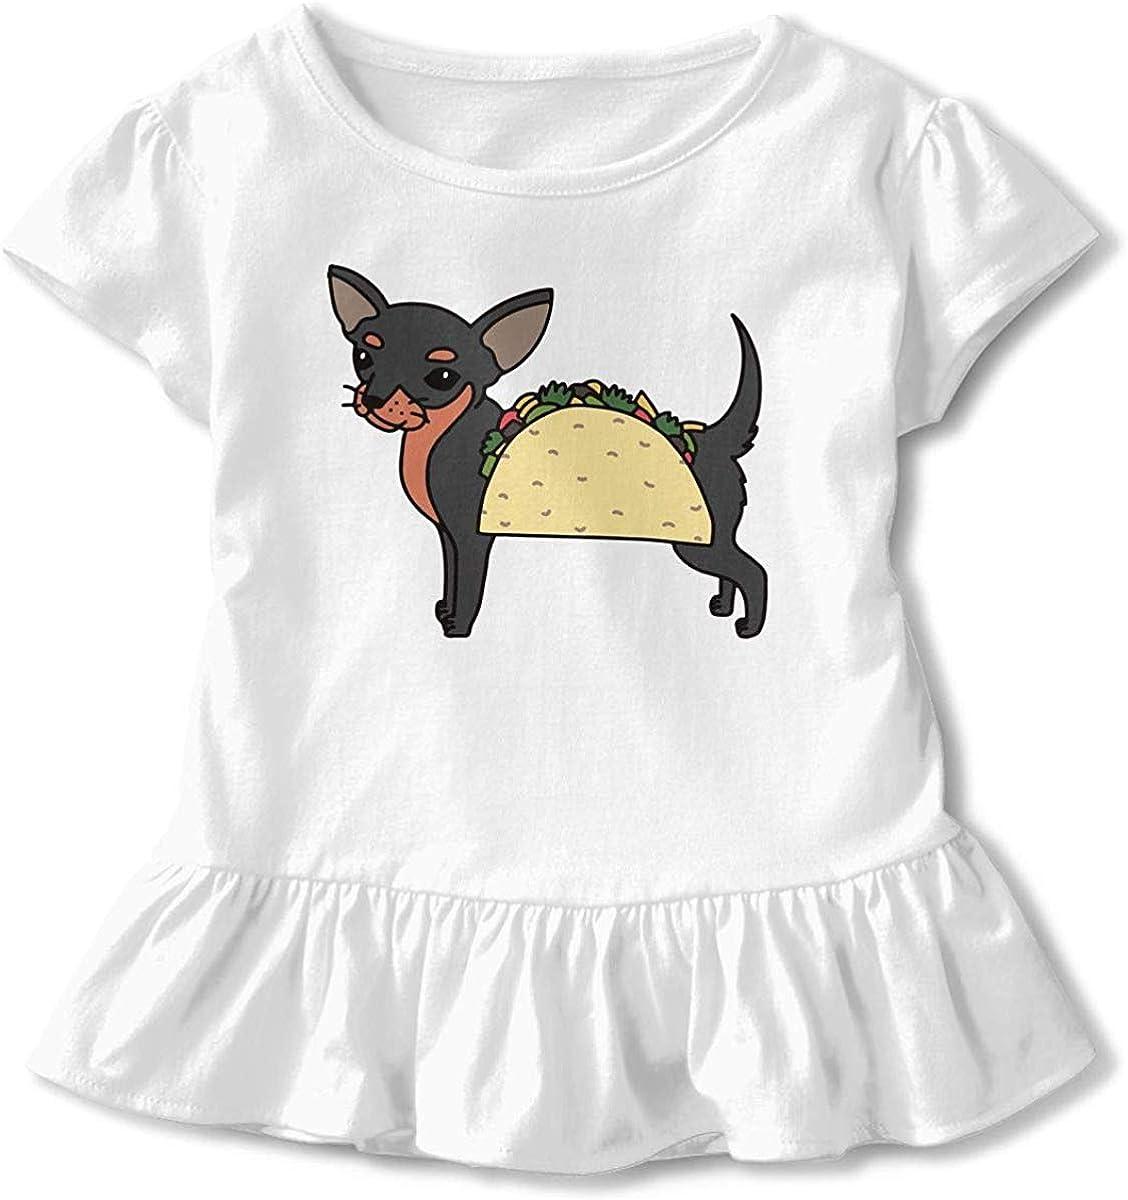 HelloWorlduk Toddler Baby Girl Chihuahua Taco Dog Funny Short Sleeve Cotton T Shirts Basic Tops Tee Clothes